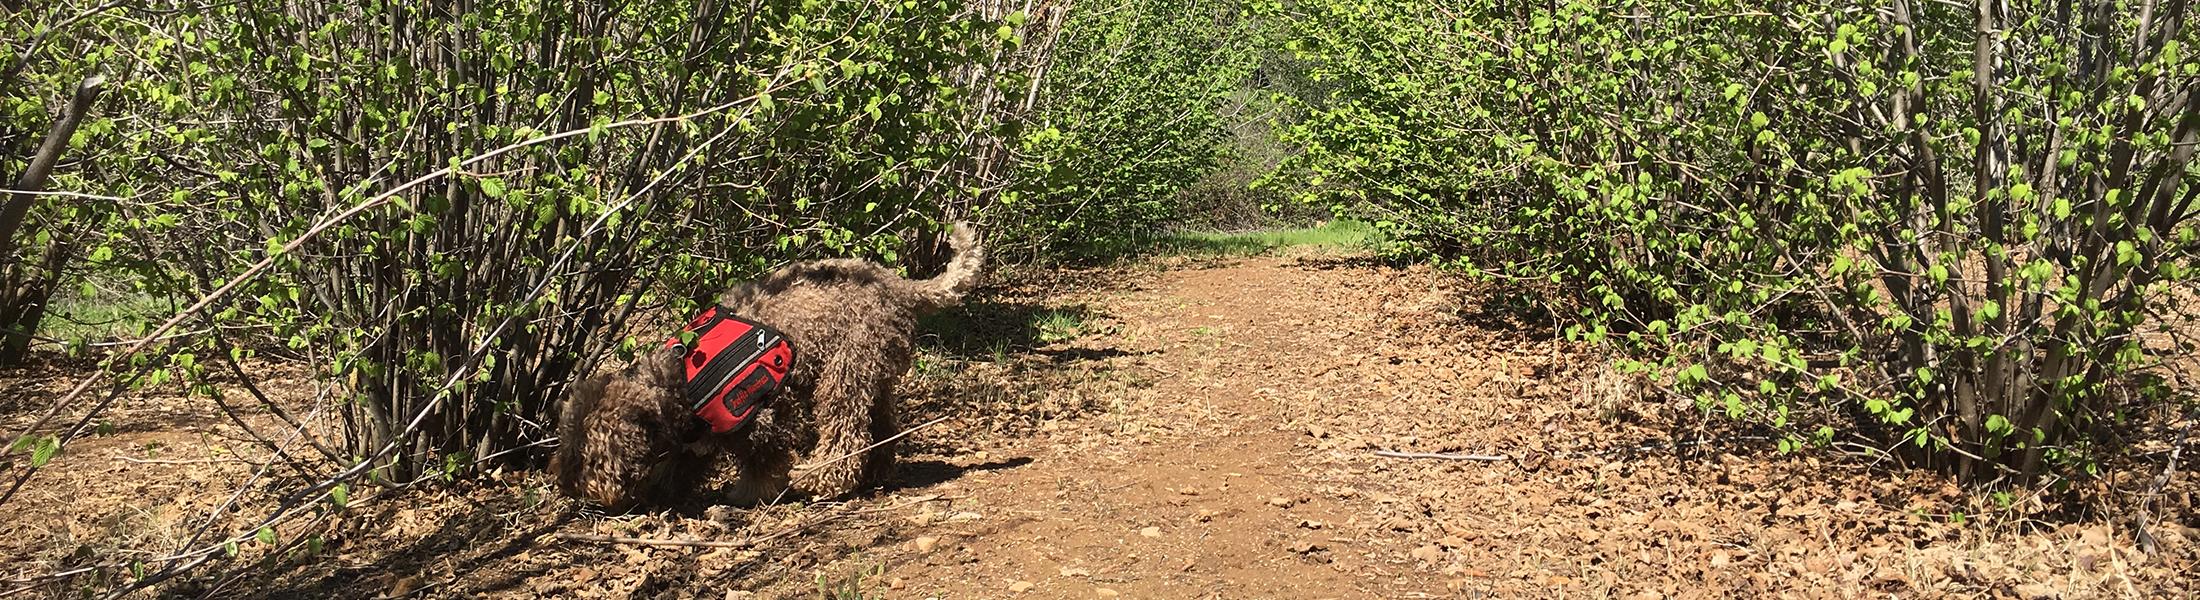 Cal Truffle Farm Tesoro Mio